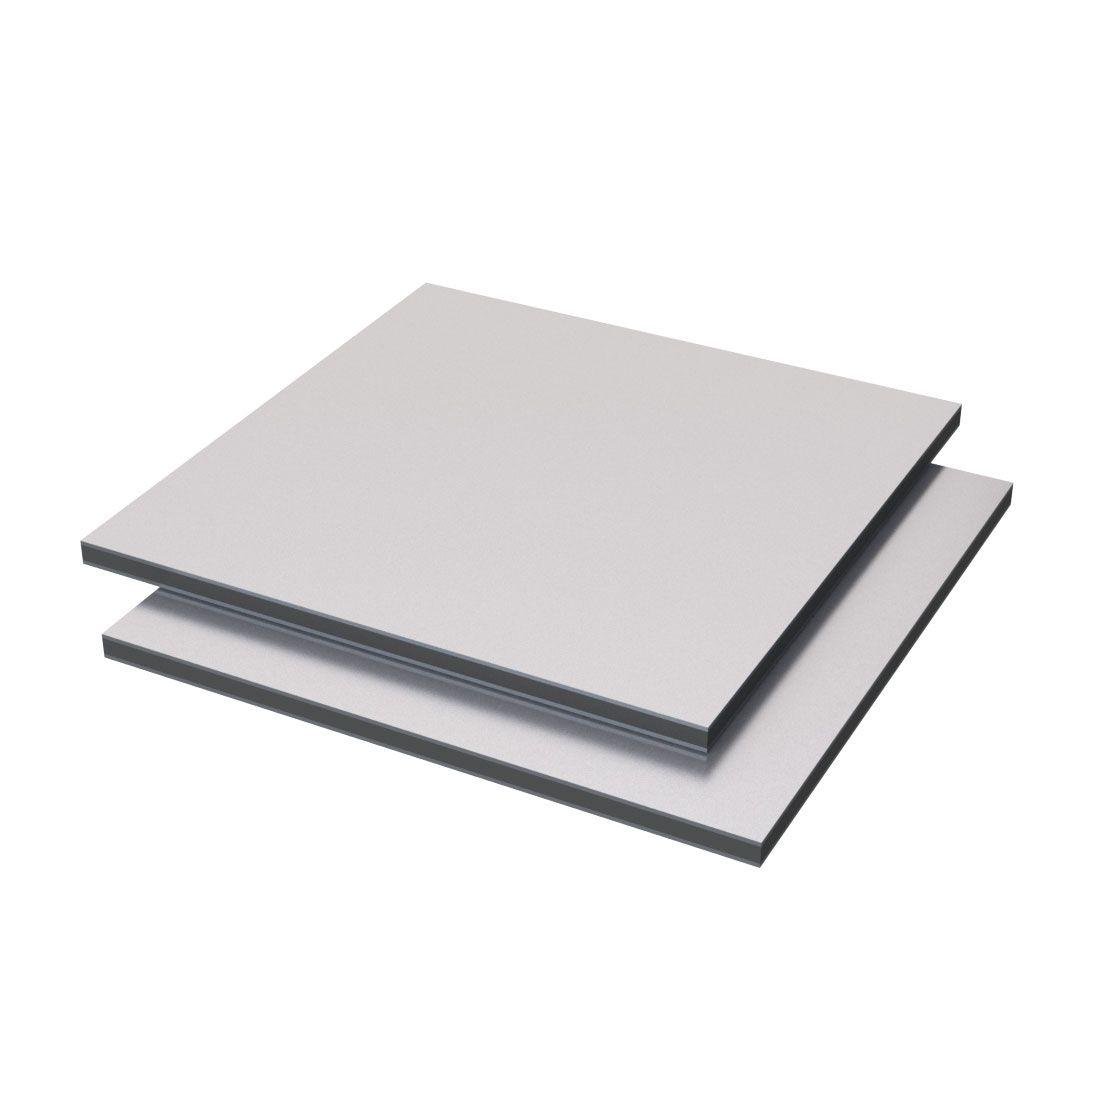 Etalbond Aluminium /PE FR Grijs Metallic 104 4050x1500x4mm Pvdf2 gecoat